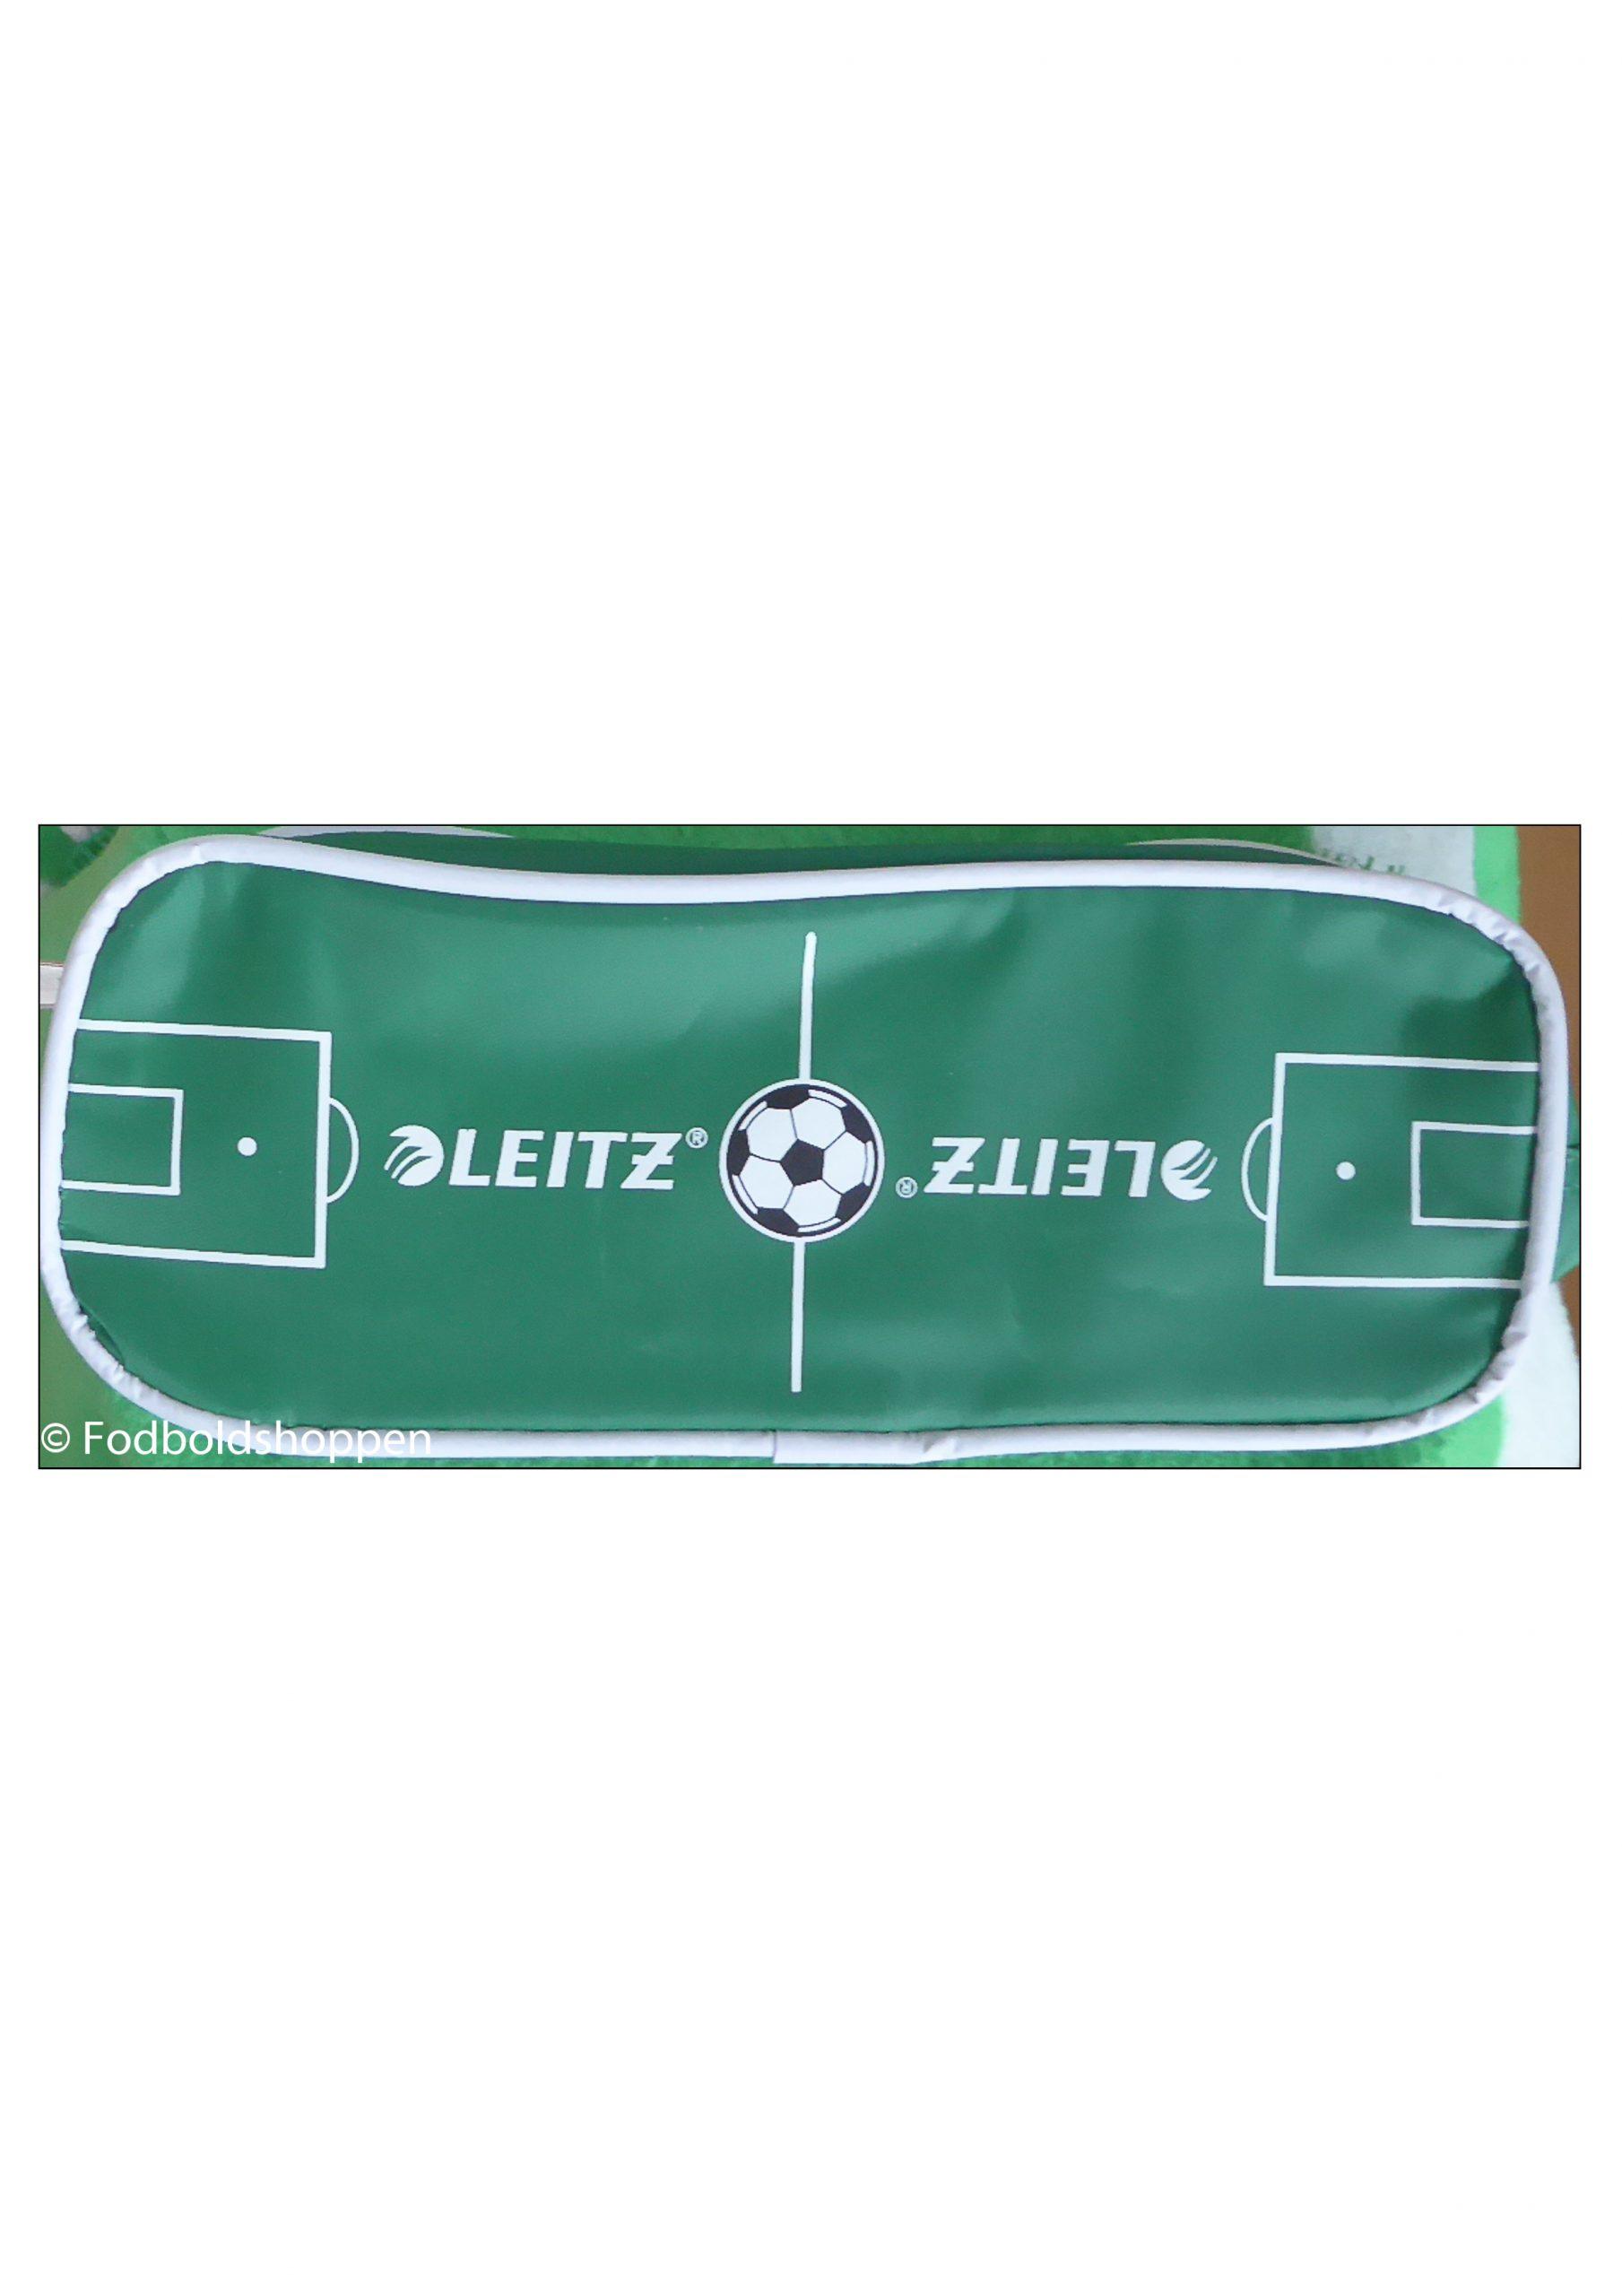 Leitz Fodbold penalhus